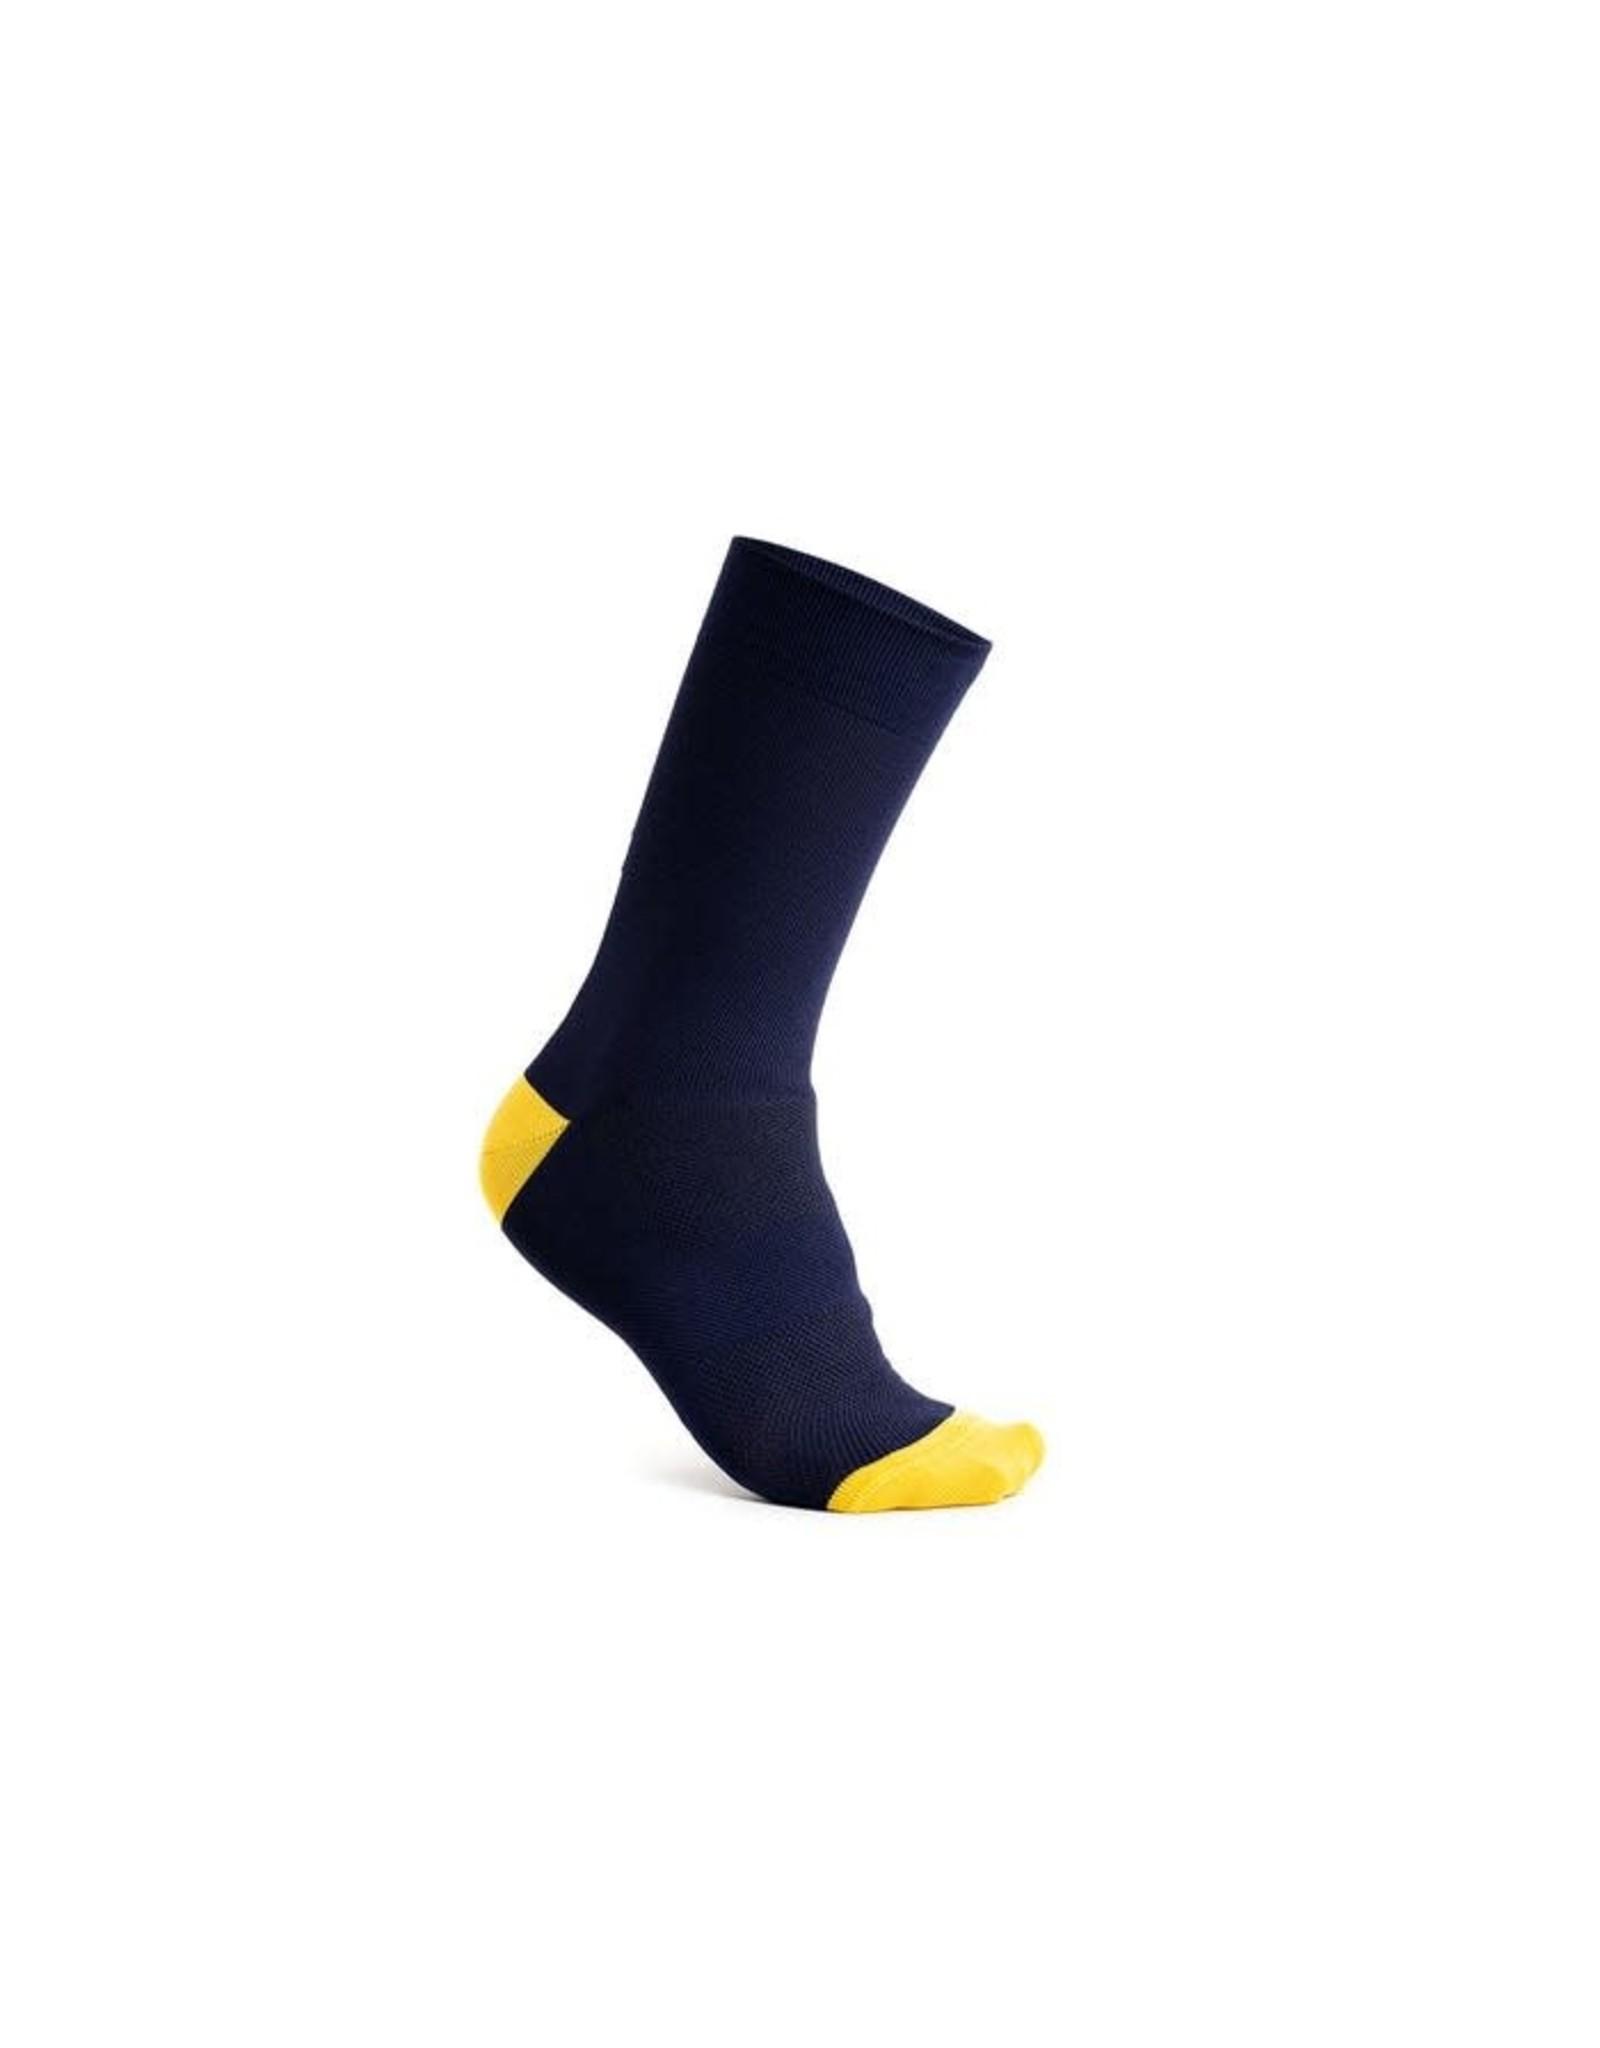 7MESH 7MESH - Word Sock Eclipse Medium